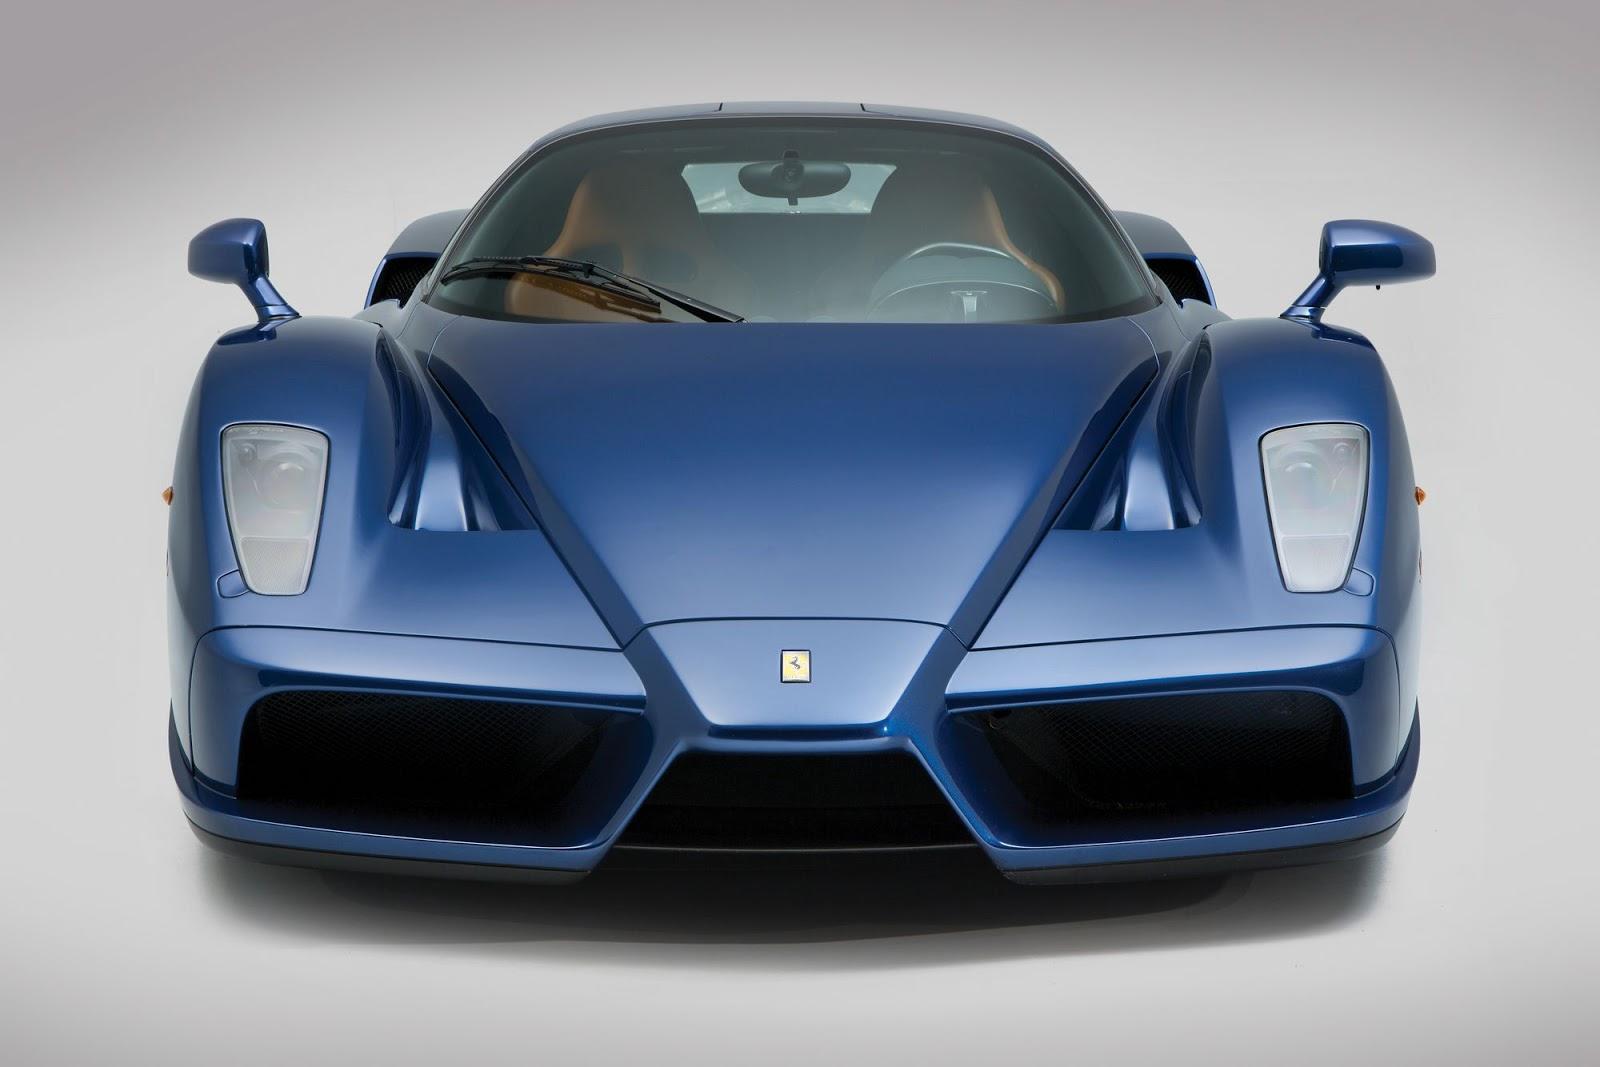 Blue Ferrari Enzo A 2 4 Million Bargain At Auction